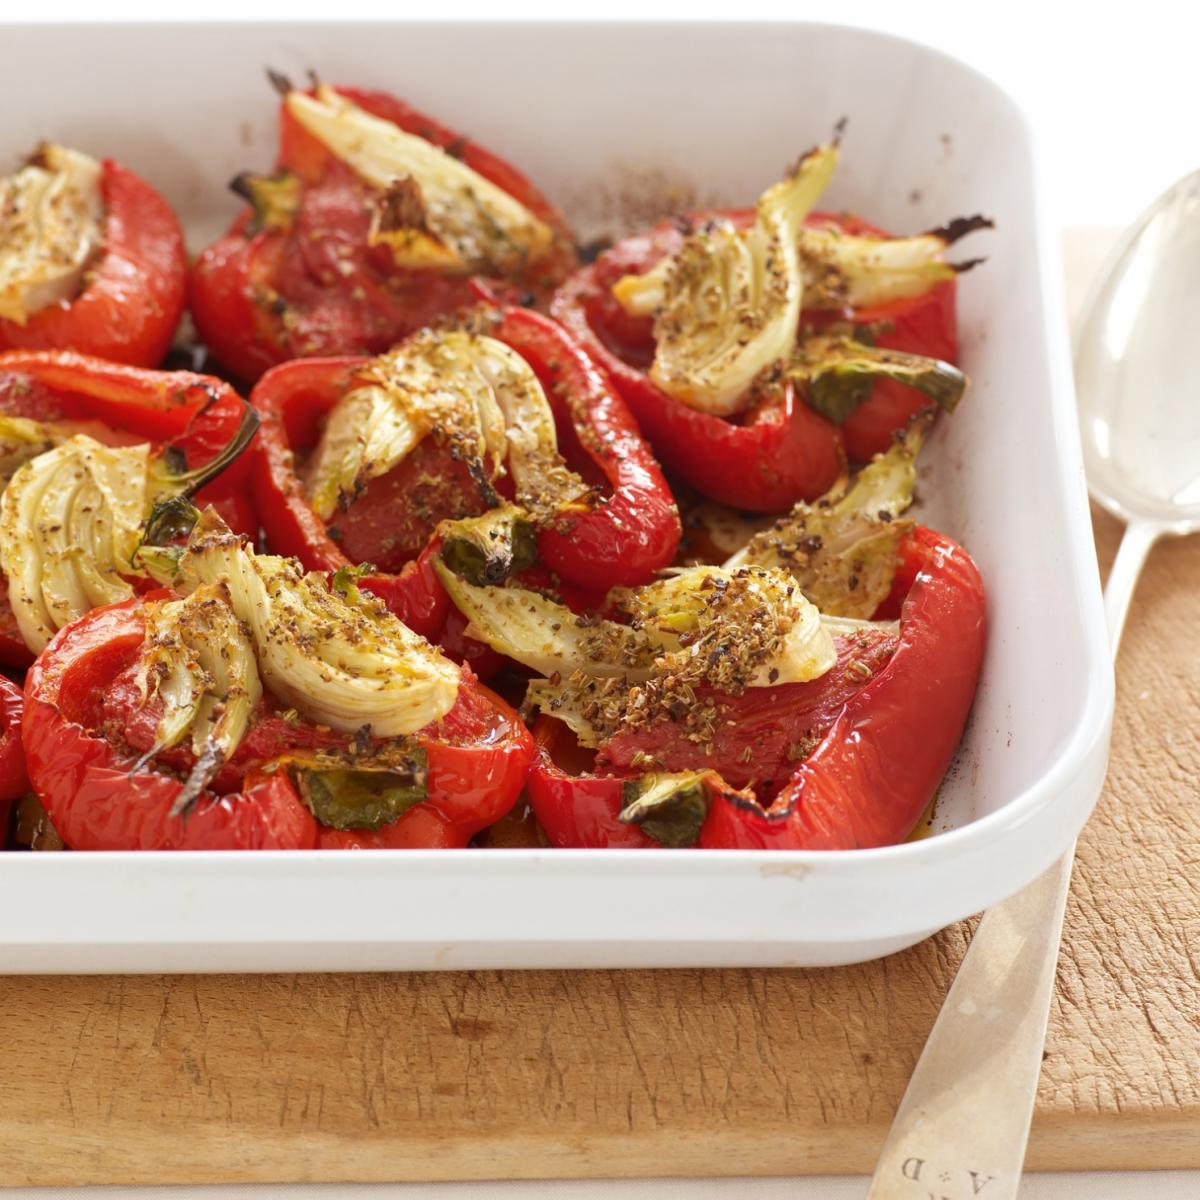 delia smith roasted vegetables recipe